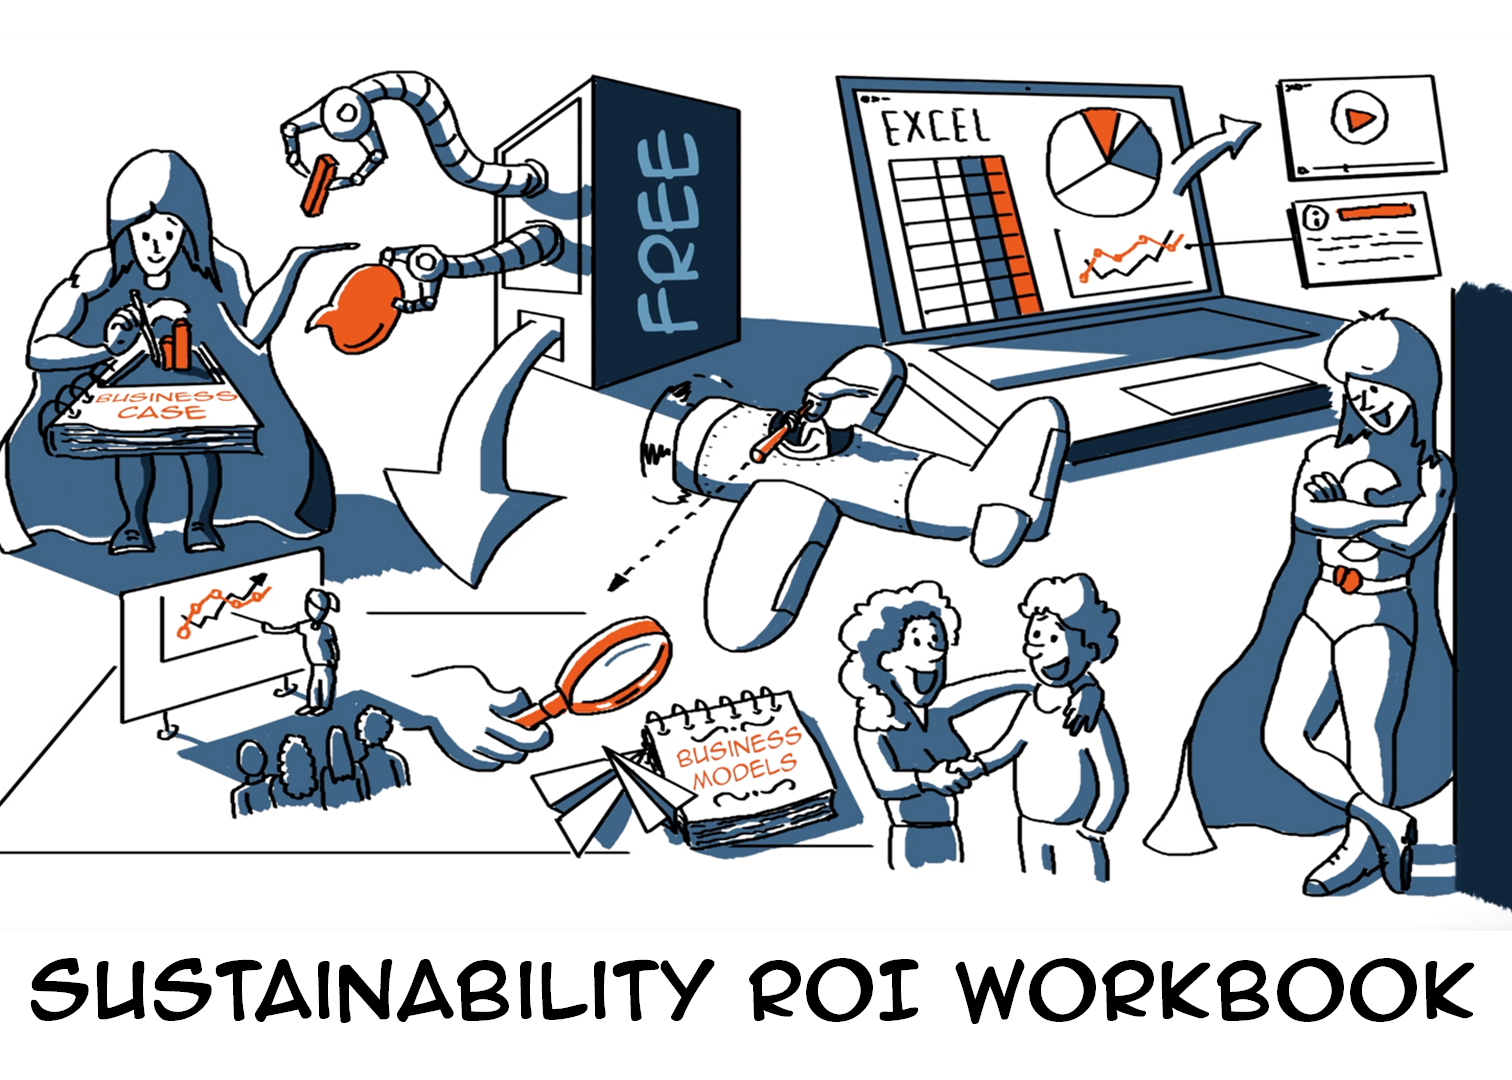 Sustainability ROI Workbook